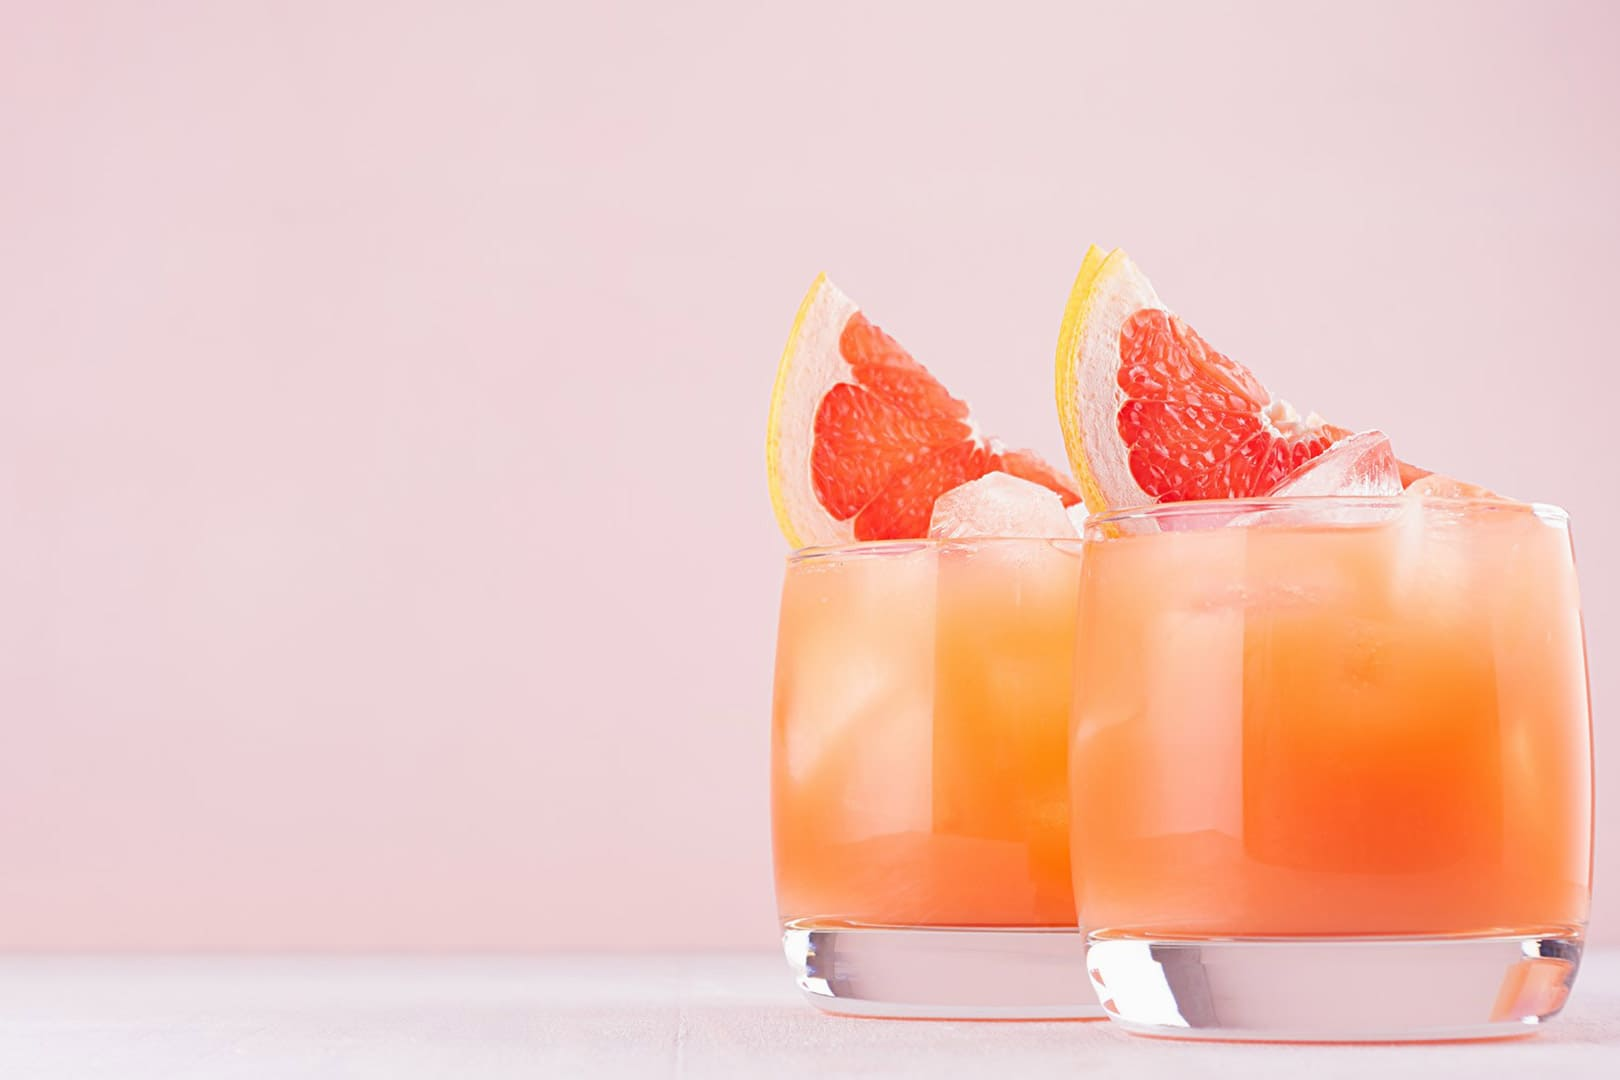 cocktails-%C3%A0-la-blanche-darmagnac.jp